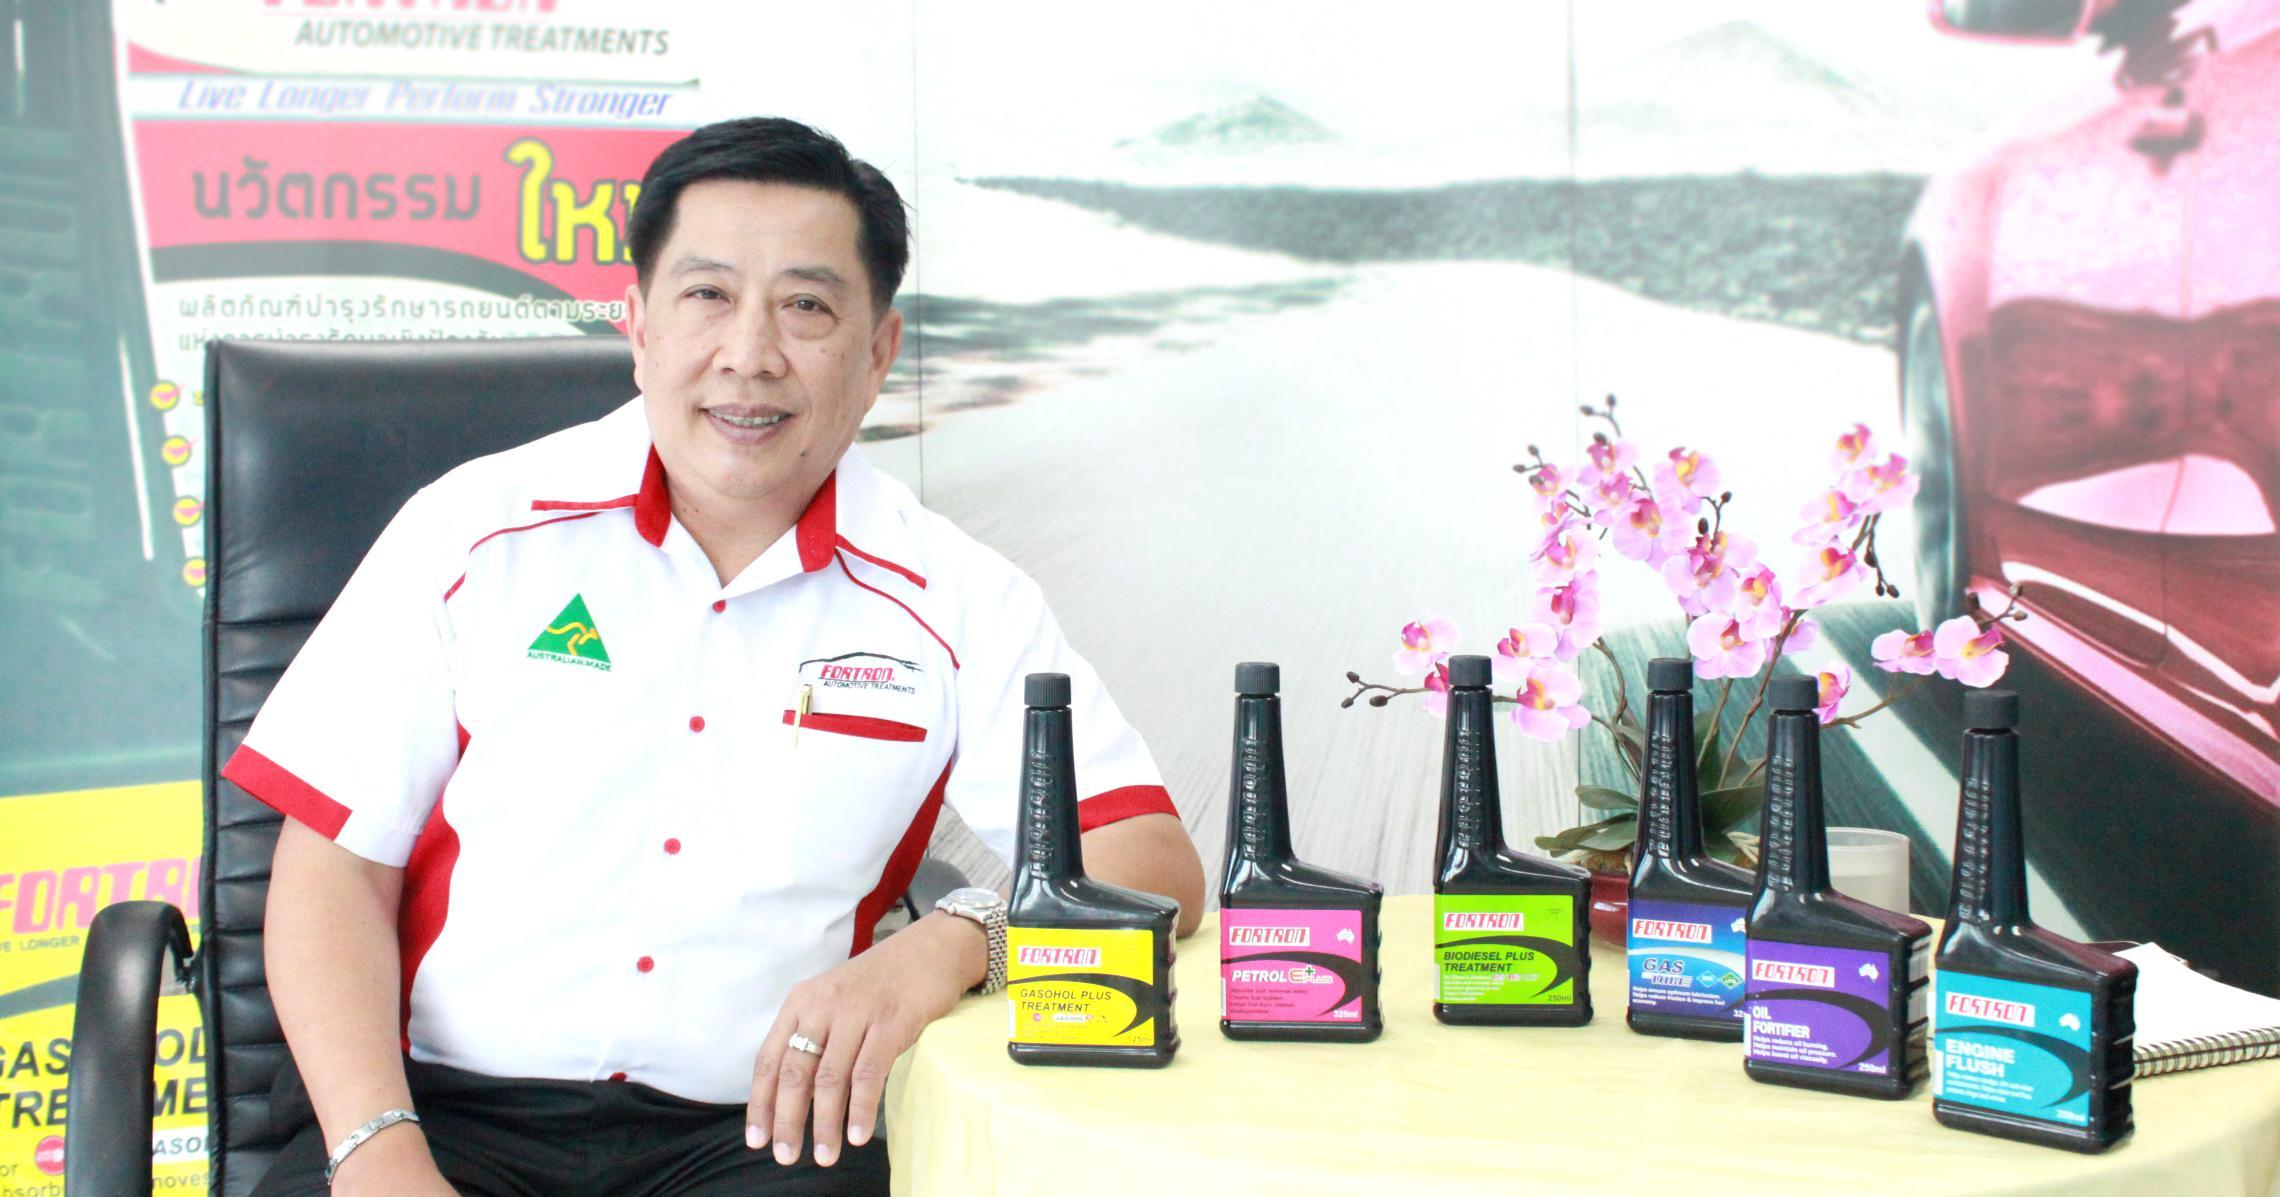 Fortron สินค้าพลังงานทดแทน ชูจุดแข็ง บุกอาเซียน